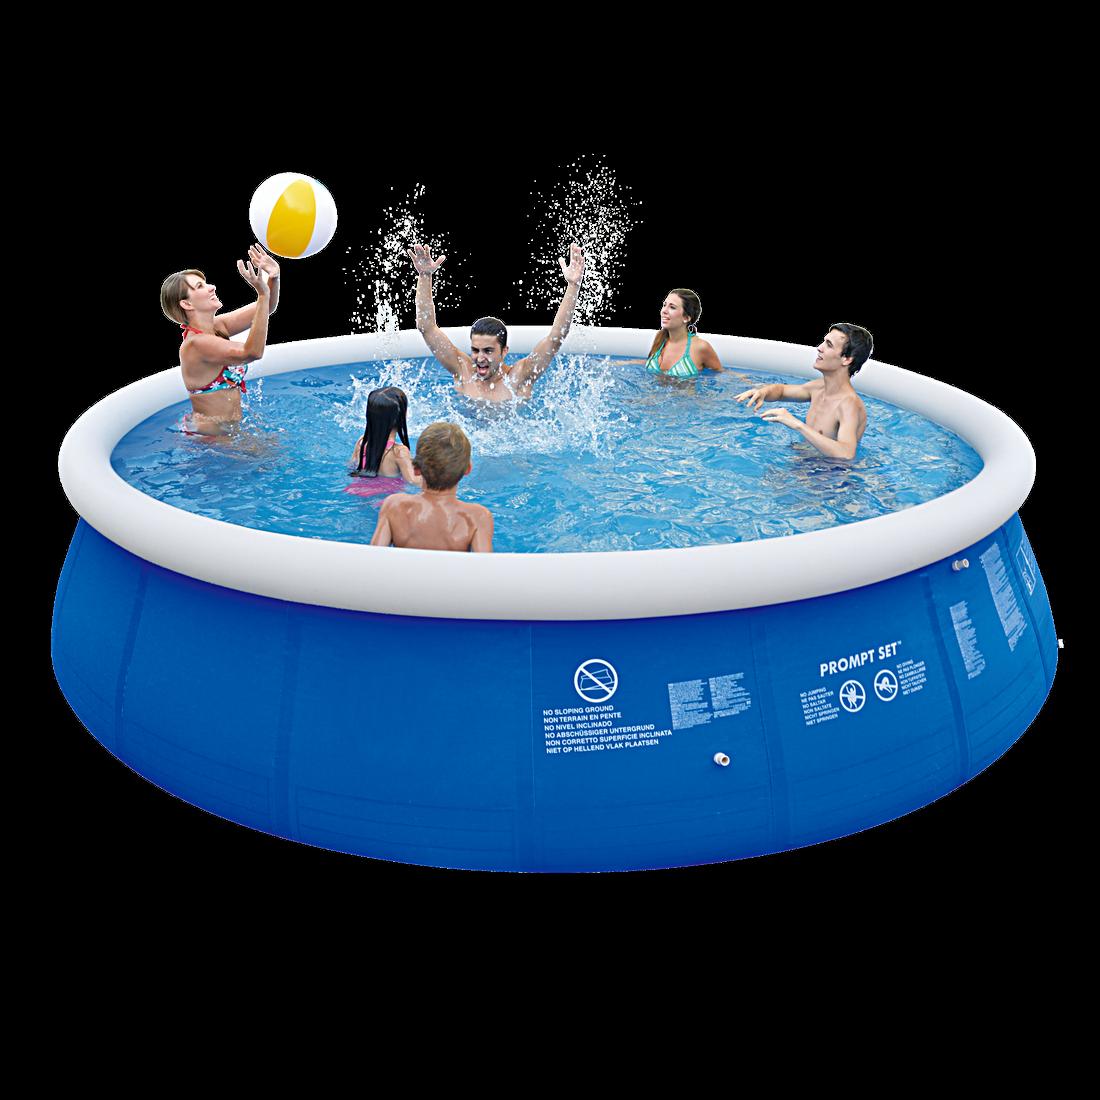 jilong marin blue 540 set quick up pool set 540x122cm mit filterpumpe und kar ebay. Black Bedroom Furniture Sets. Home Design Ideas